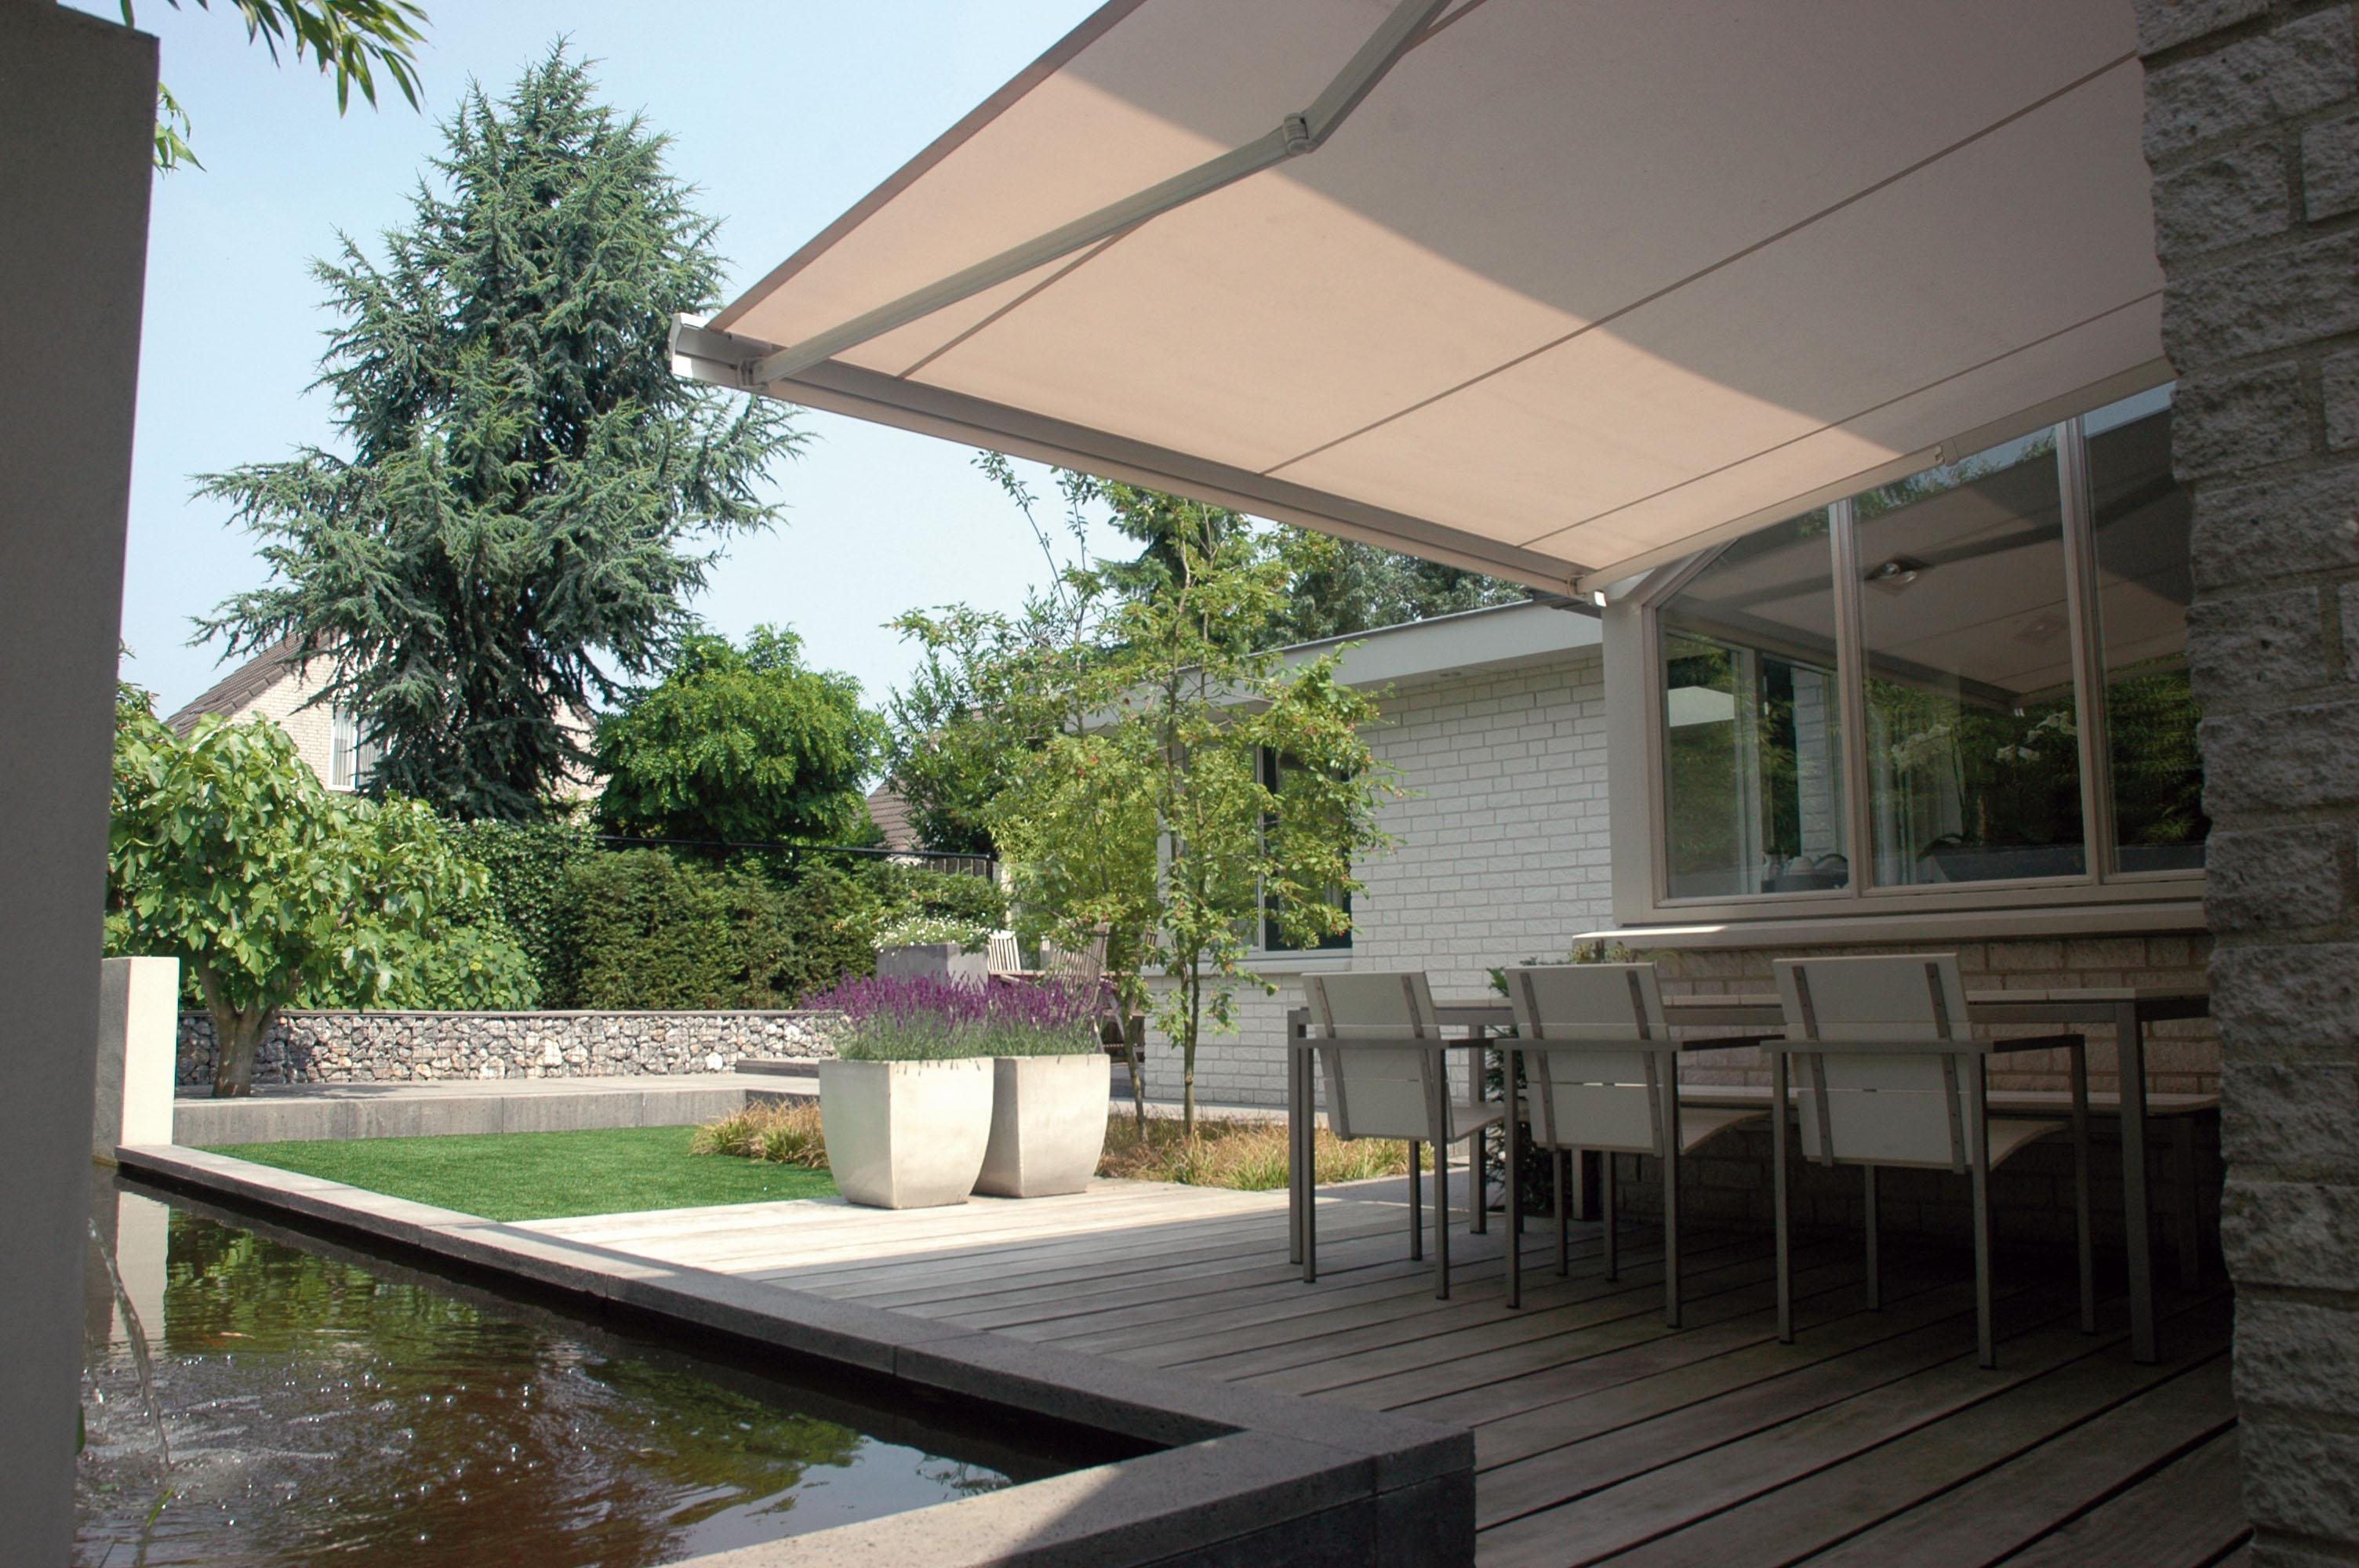 Knikarmscherm zonnescherm aanbieding - Gordijnen voor overdekt terras ...